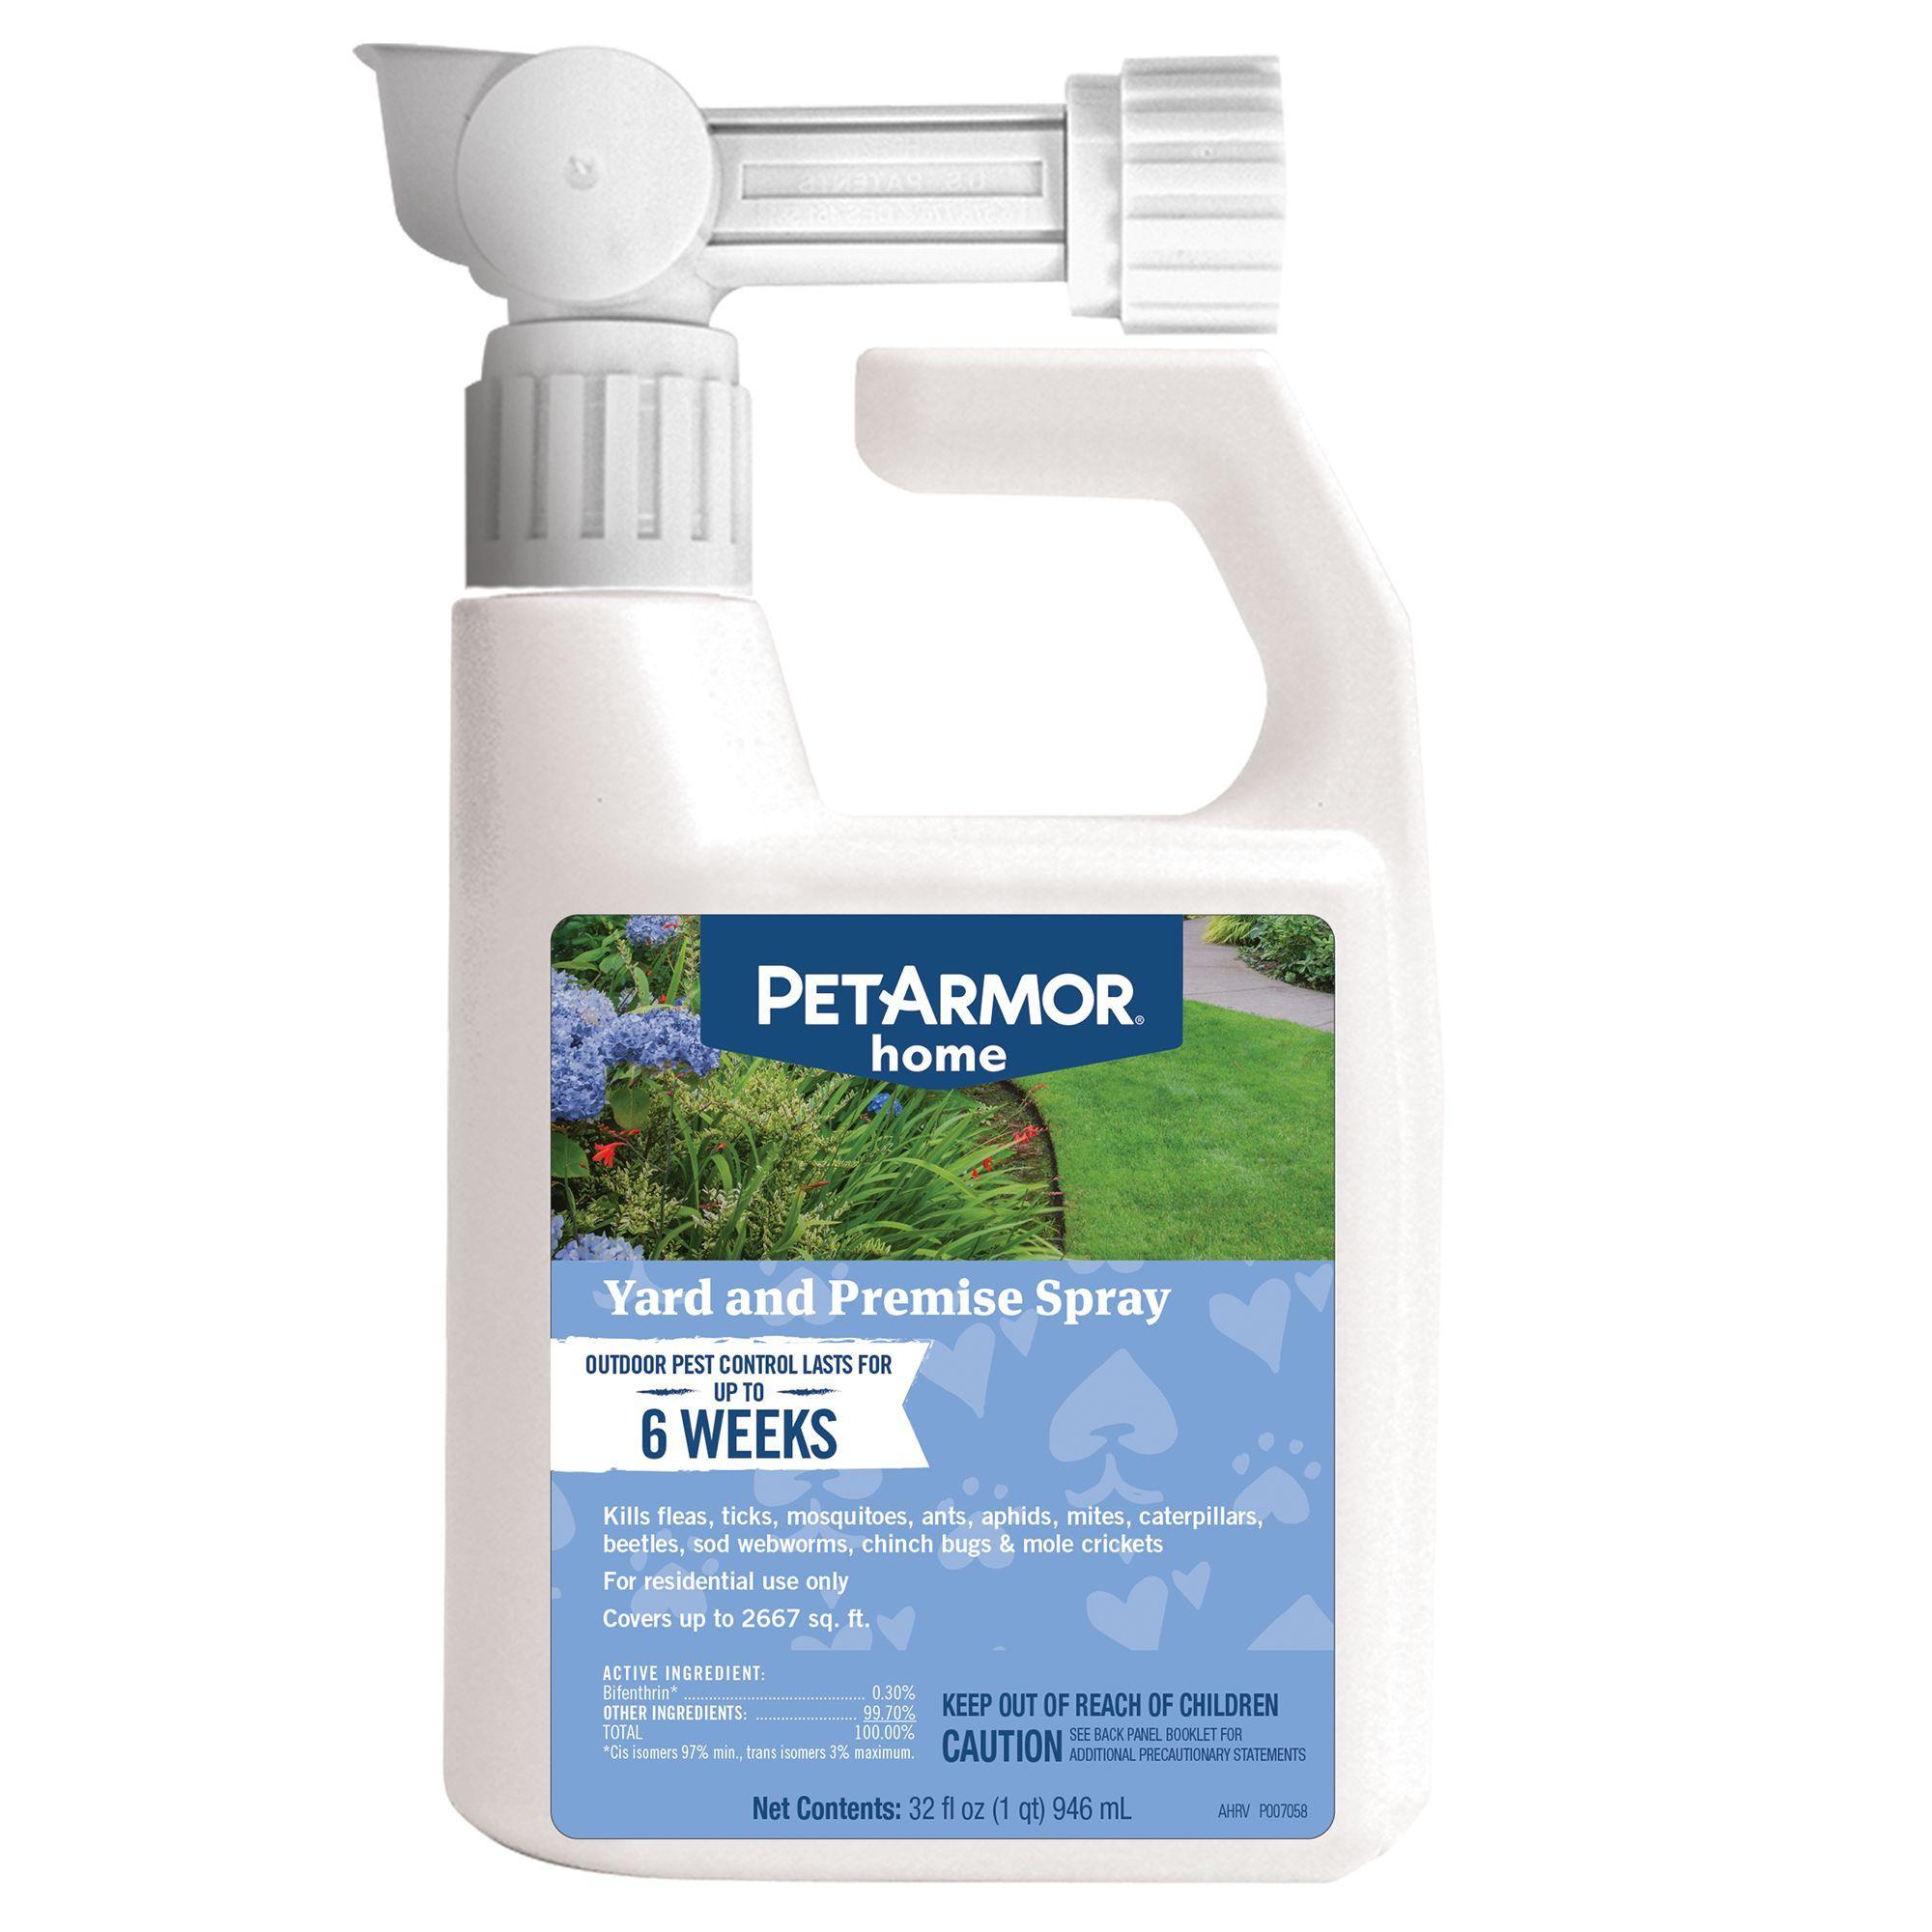 Petarmor home flea tick yard premise spray fleas